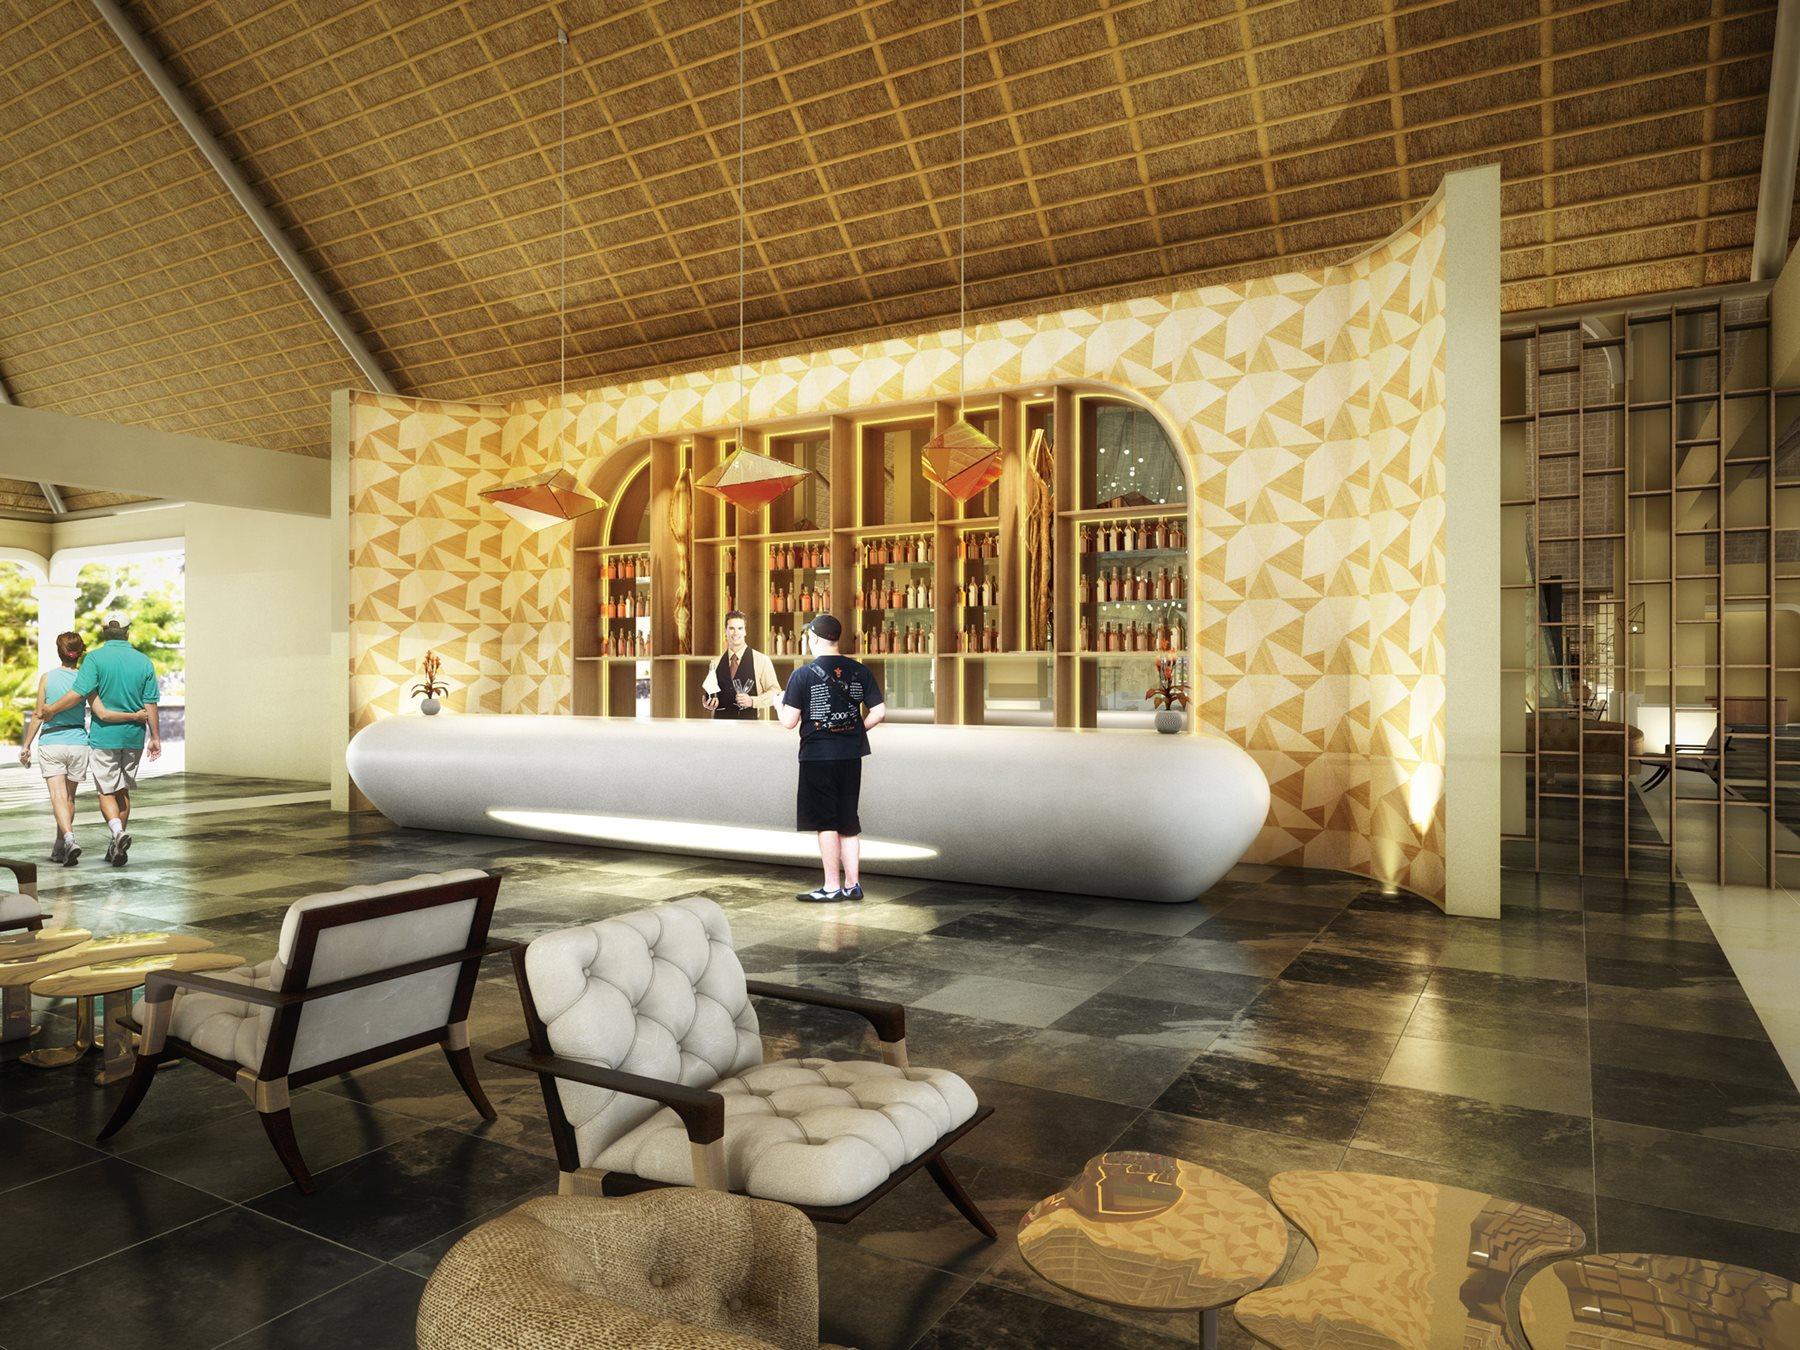 RIV-The-Royal-Suites-Yucatan-Lobby-Bar-001-Render